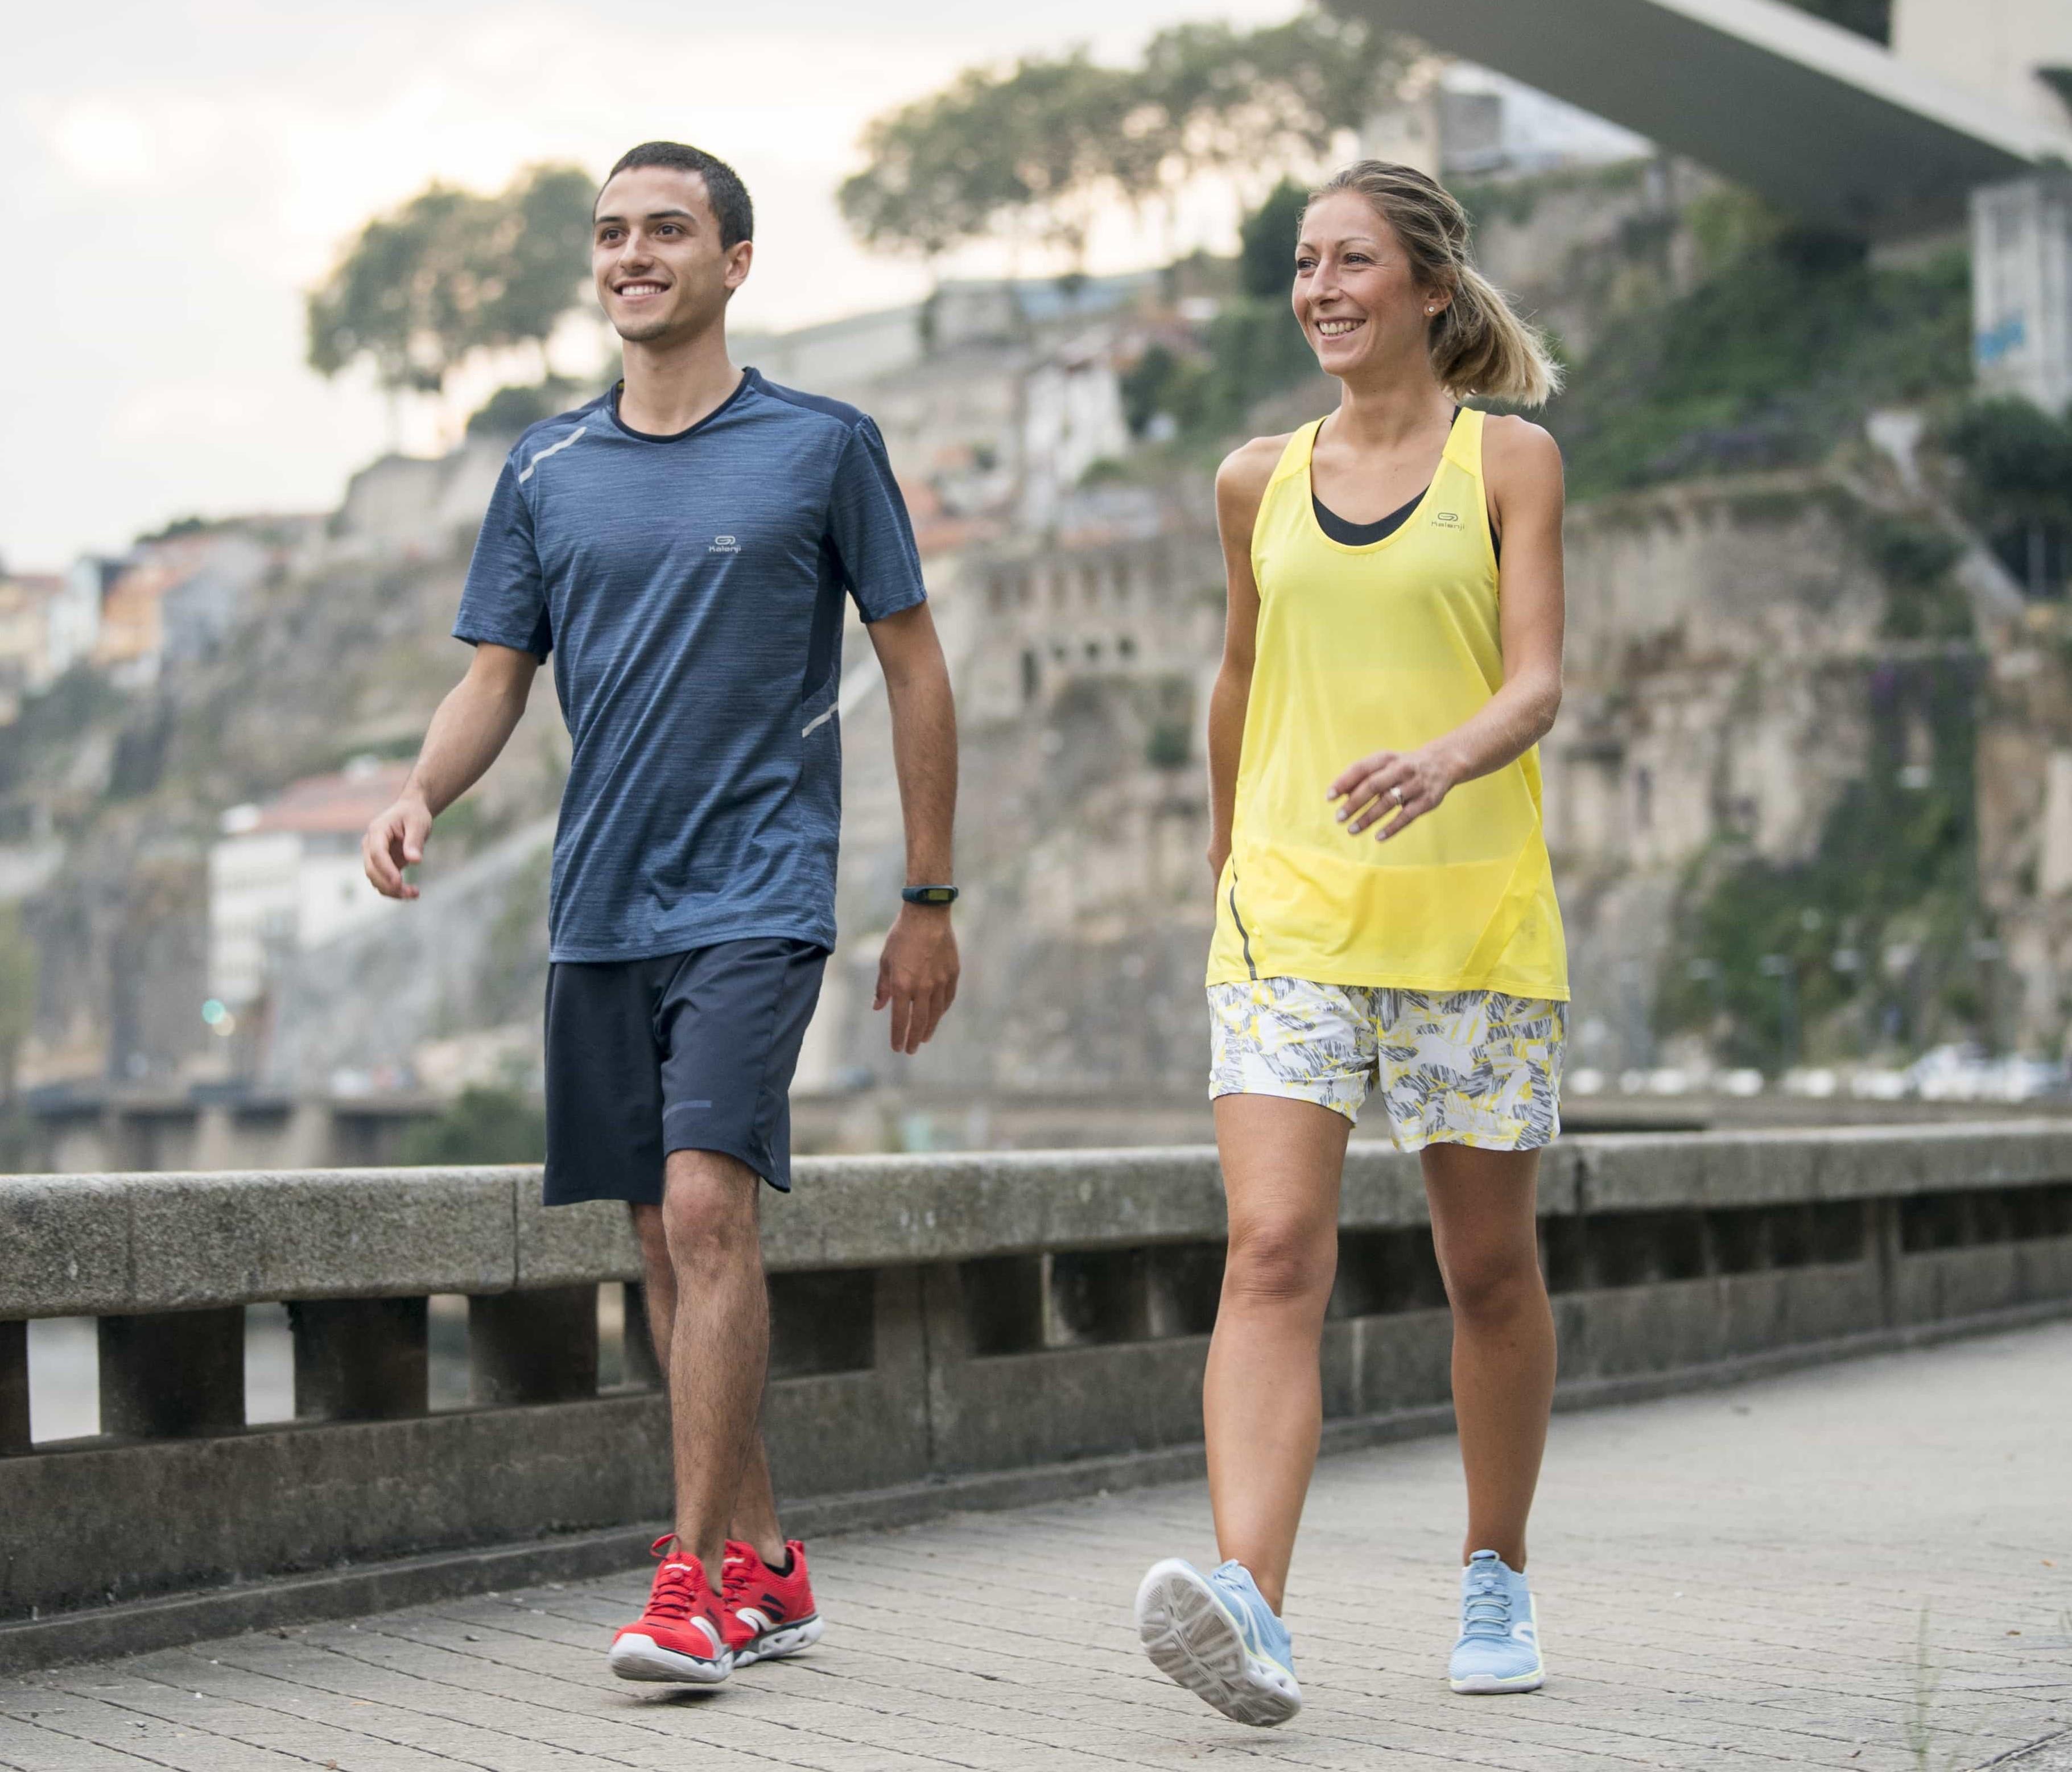 10 Benefits Of Morning Walks